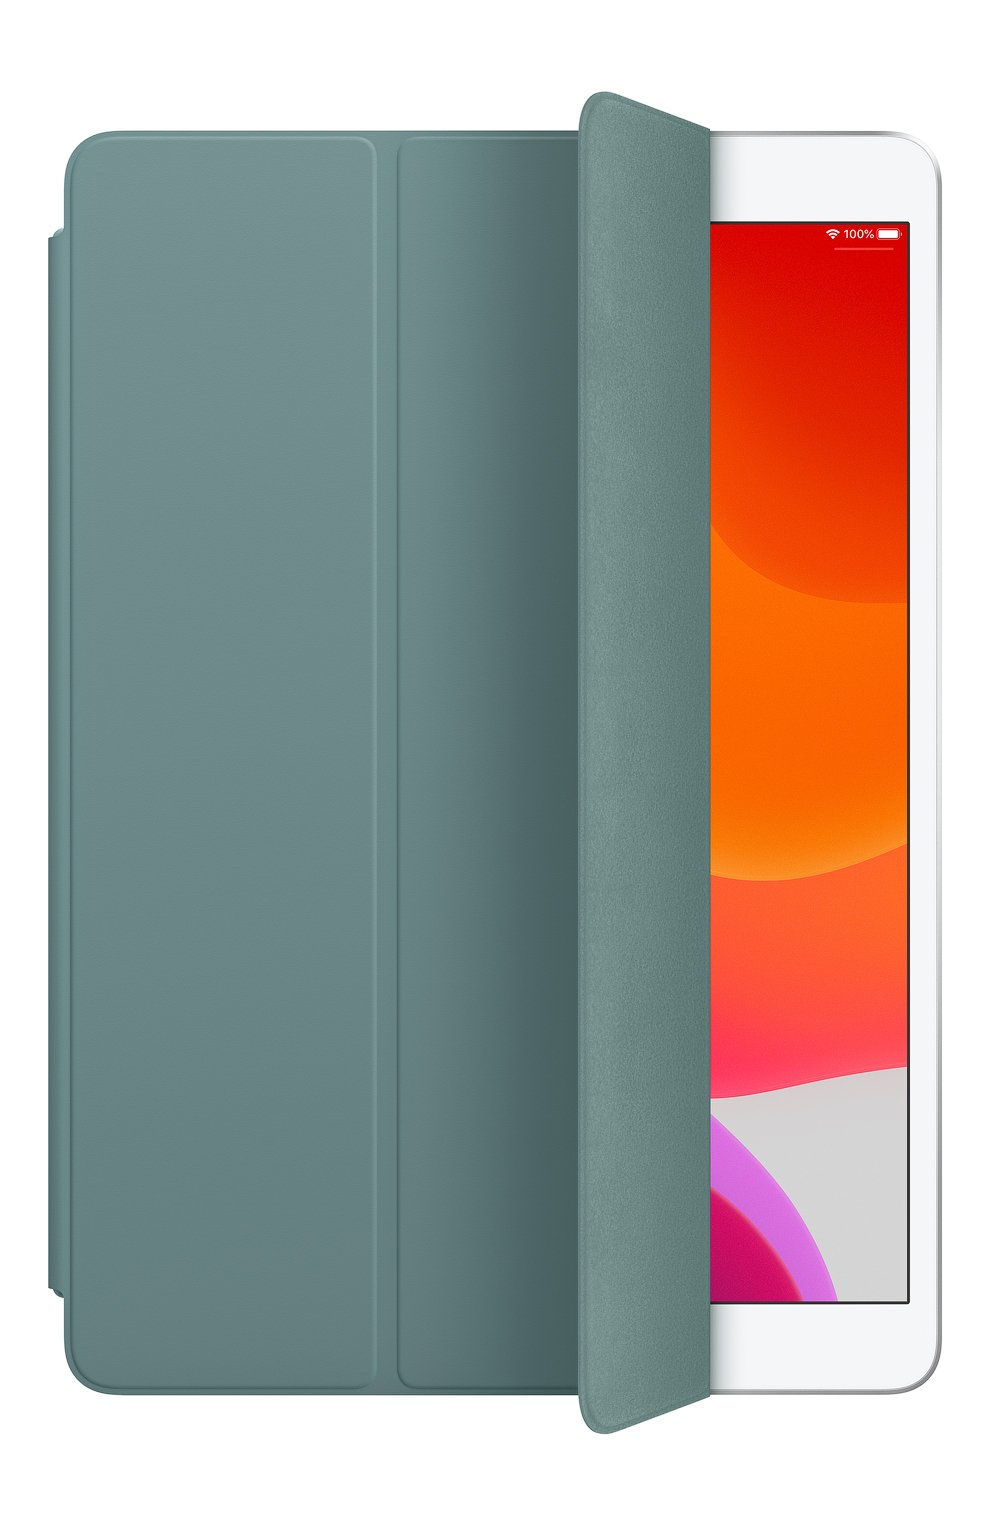 Чехол smart cover для ipad (7th gen)/ipad air (3rd gen) APPLE  светло-зеленого цвета, арт. MY1U2ZM/A | Фото 2